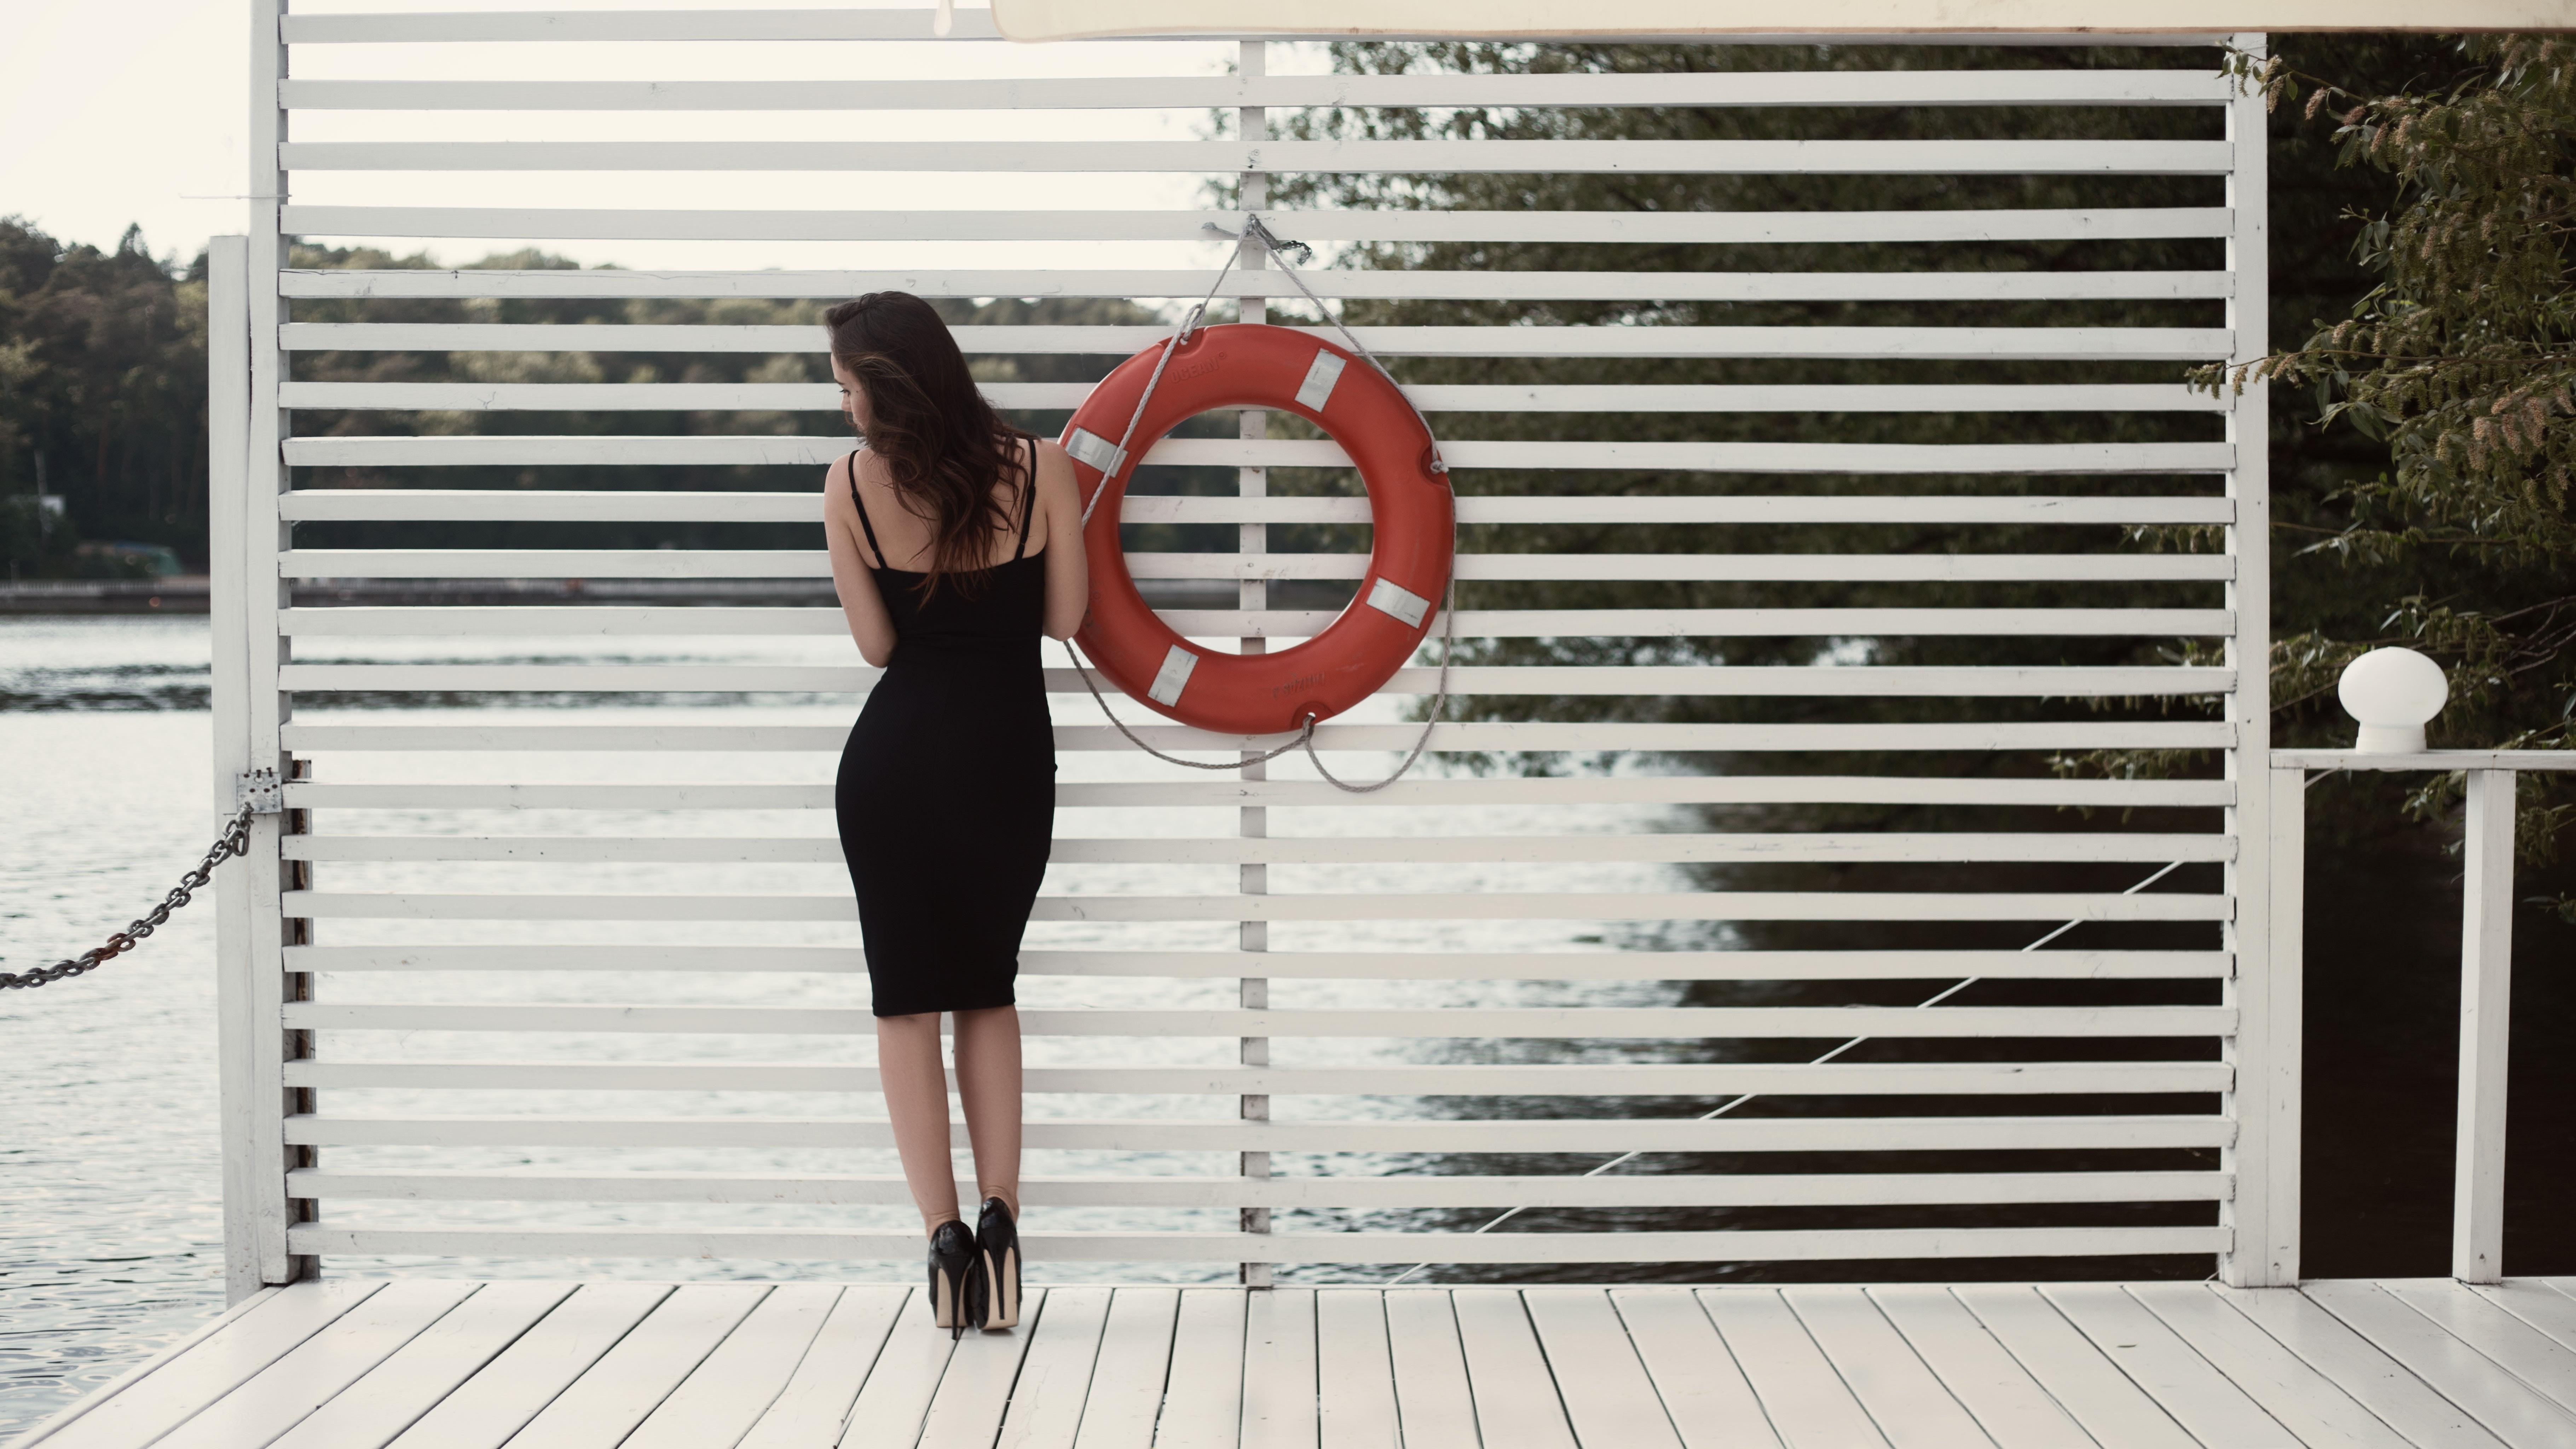 Woman in Black Sheath Dress Beside Swim Ring on Dock, Model, Young, Wooden flooring, Woman, HQ Photo